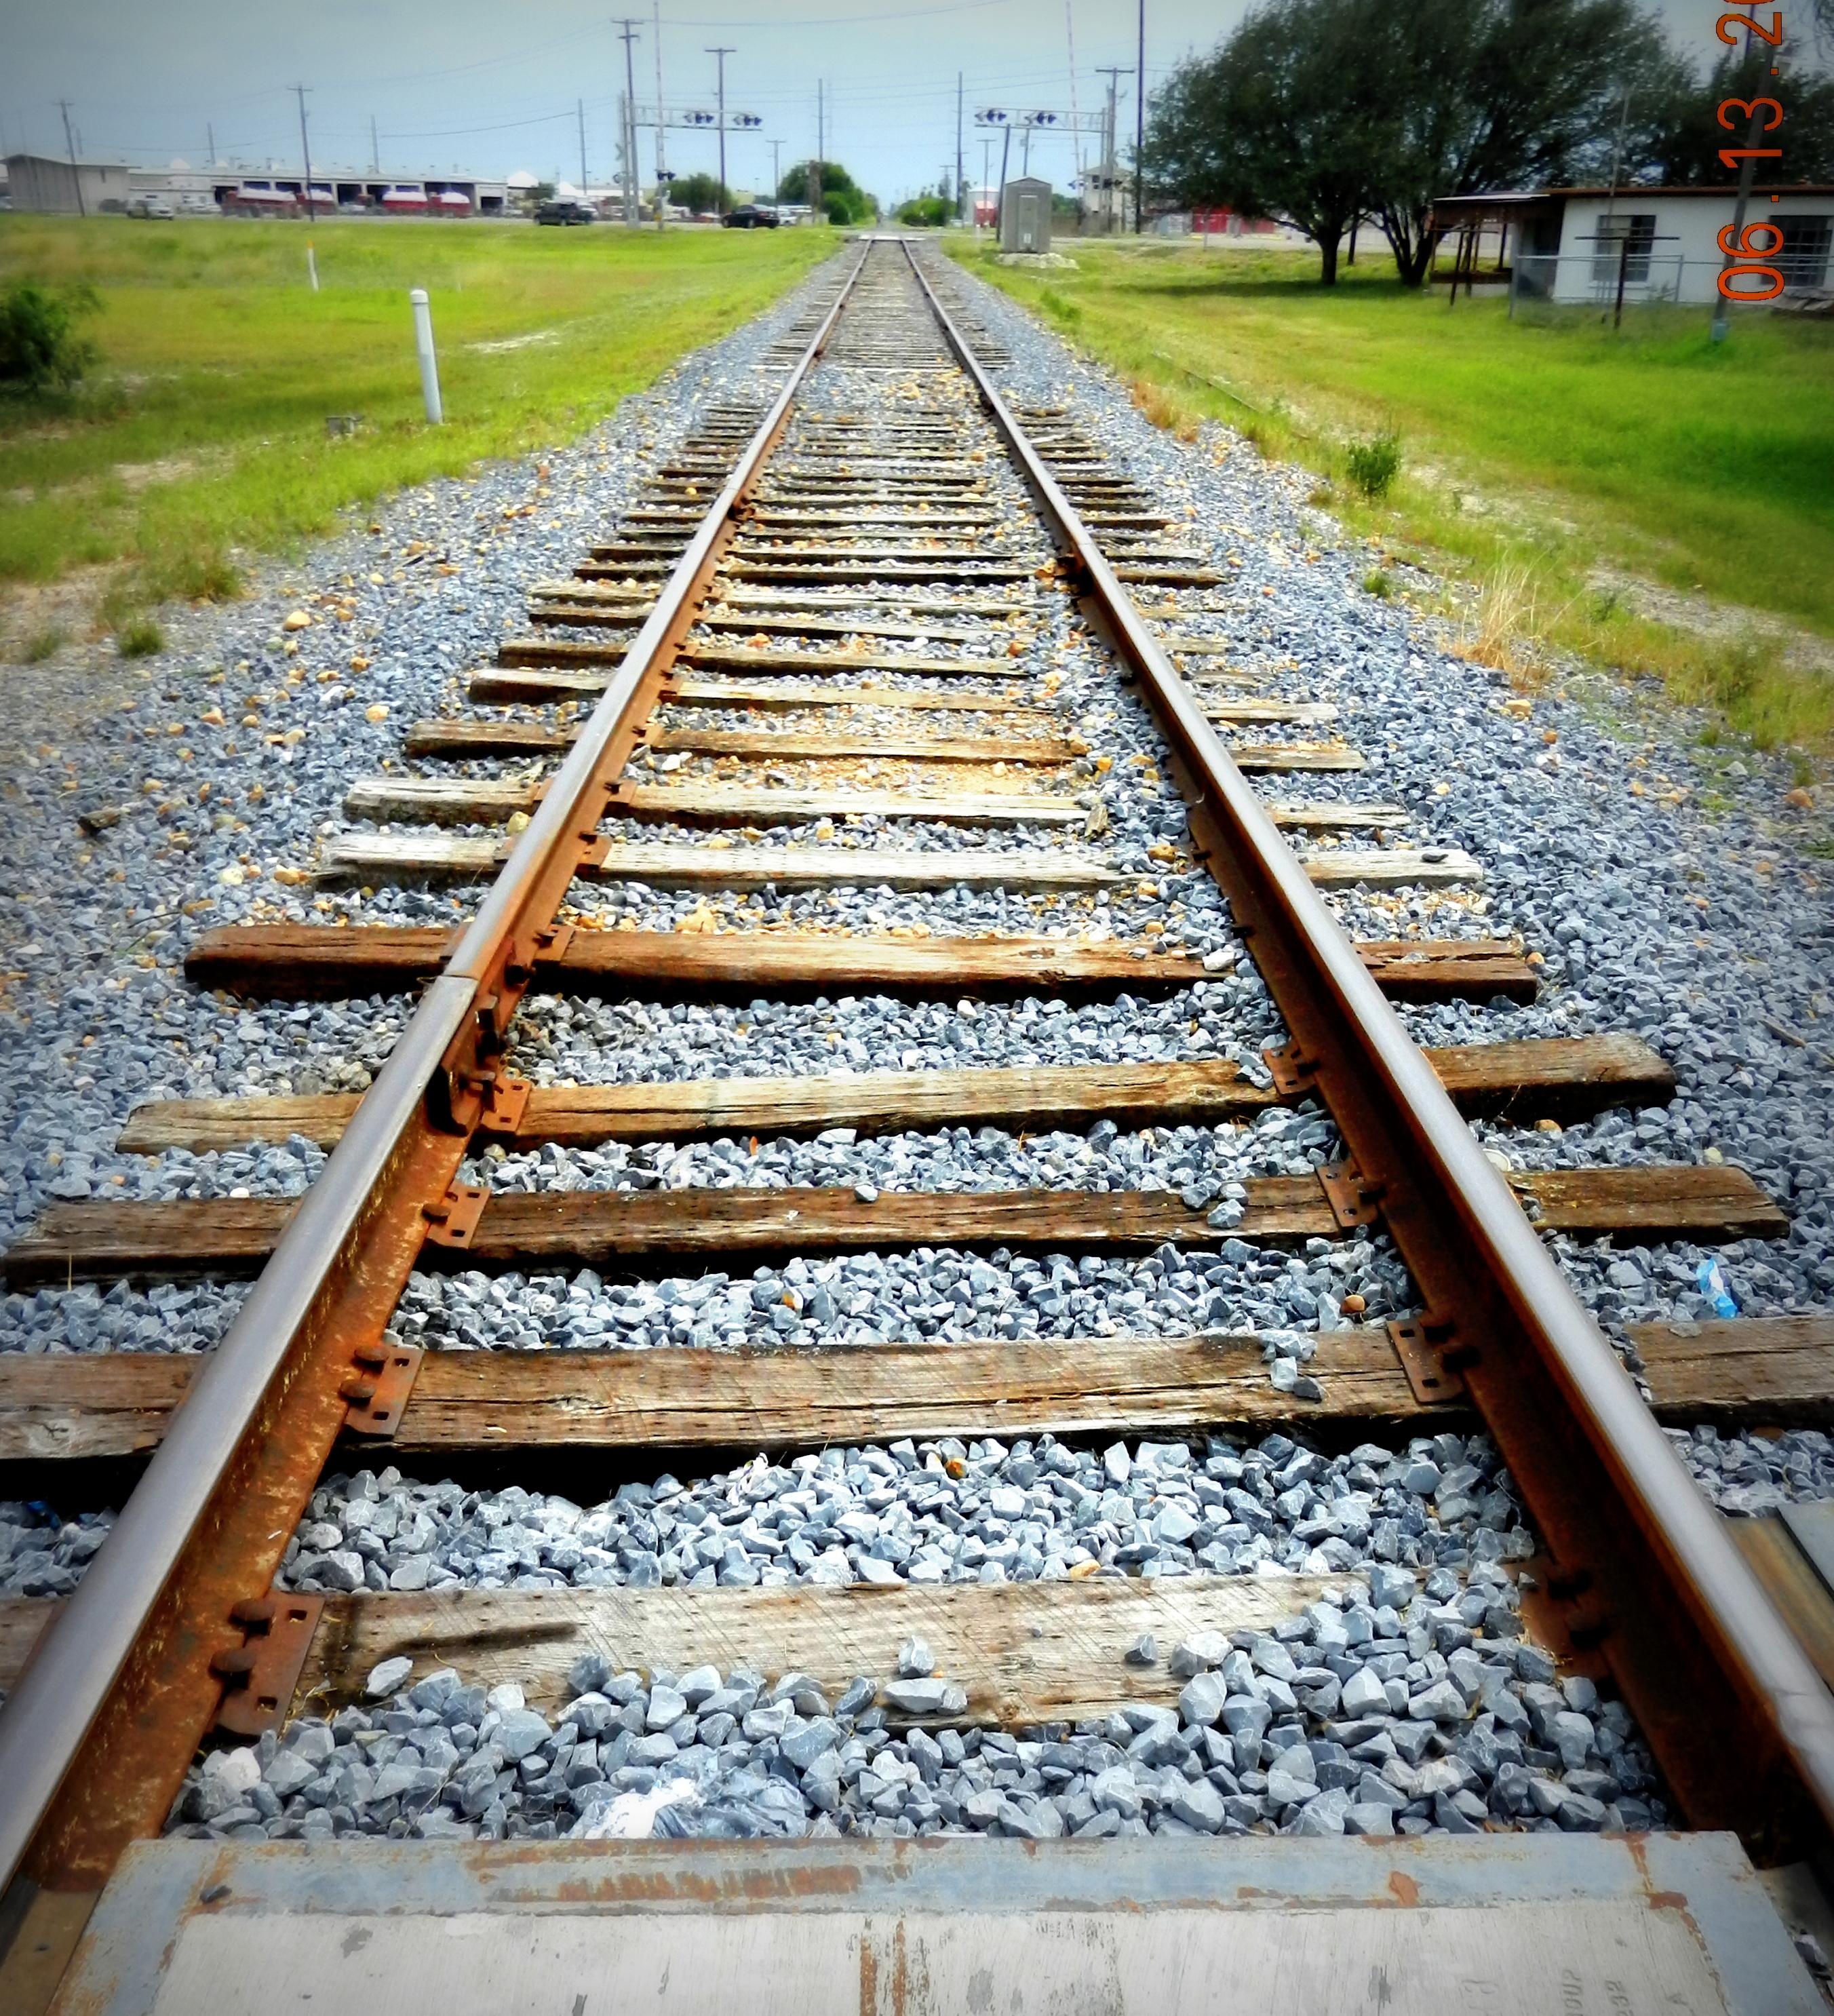 Rail track, Path, Rail, Railroad, Tracks, HQ Photo